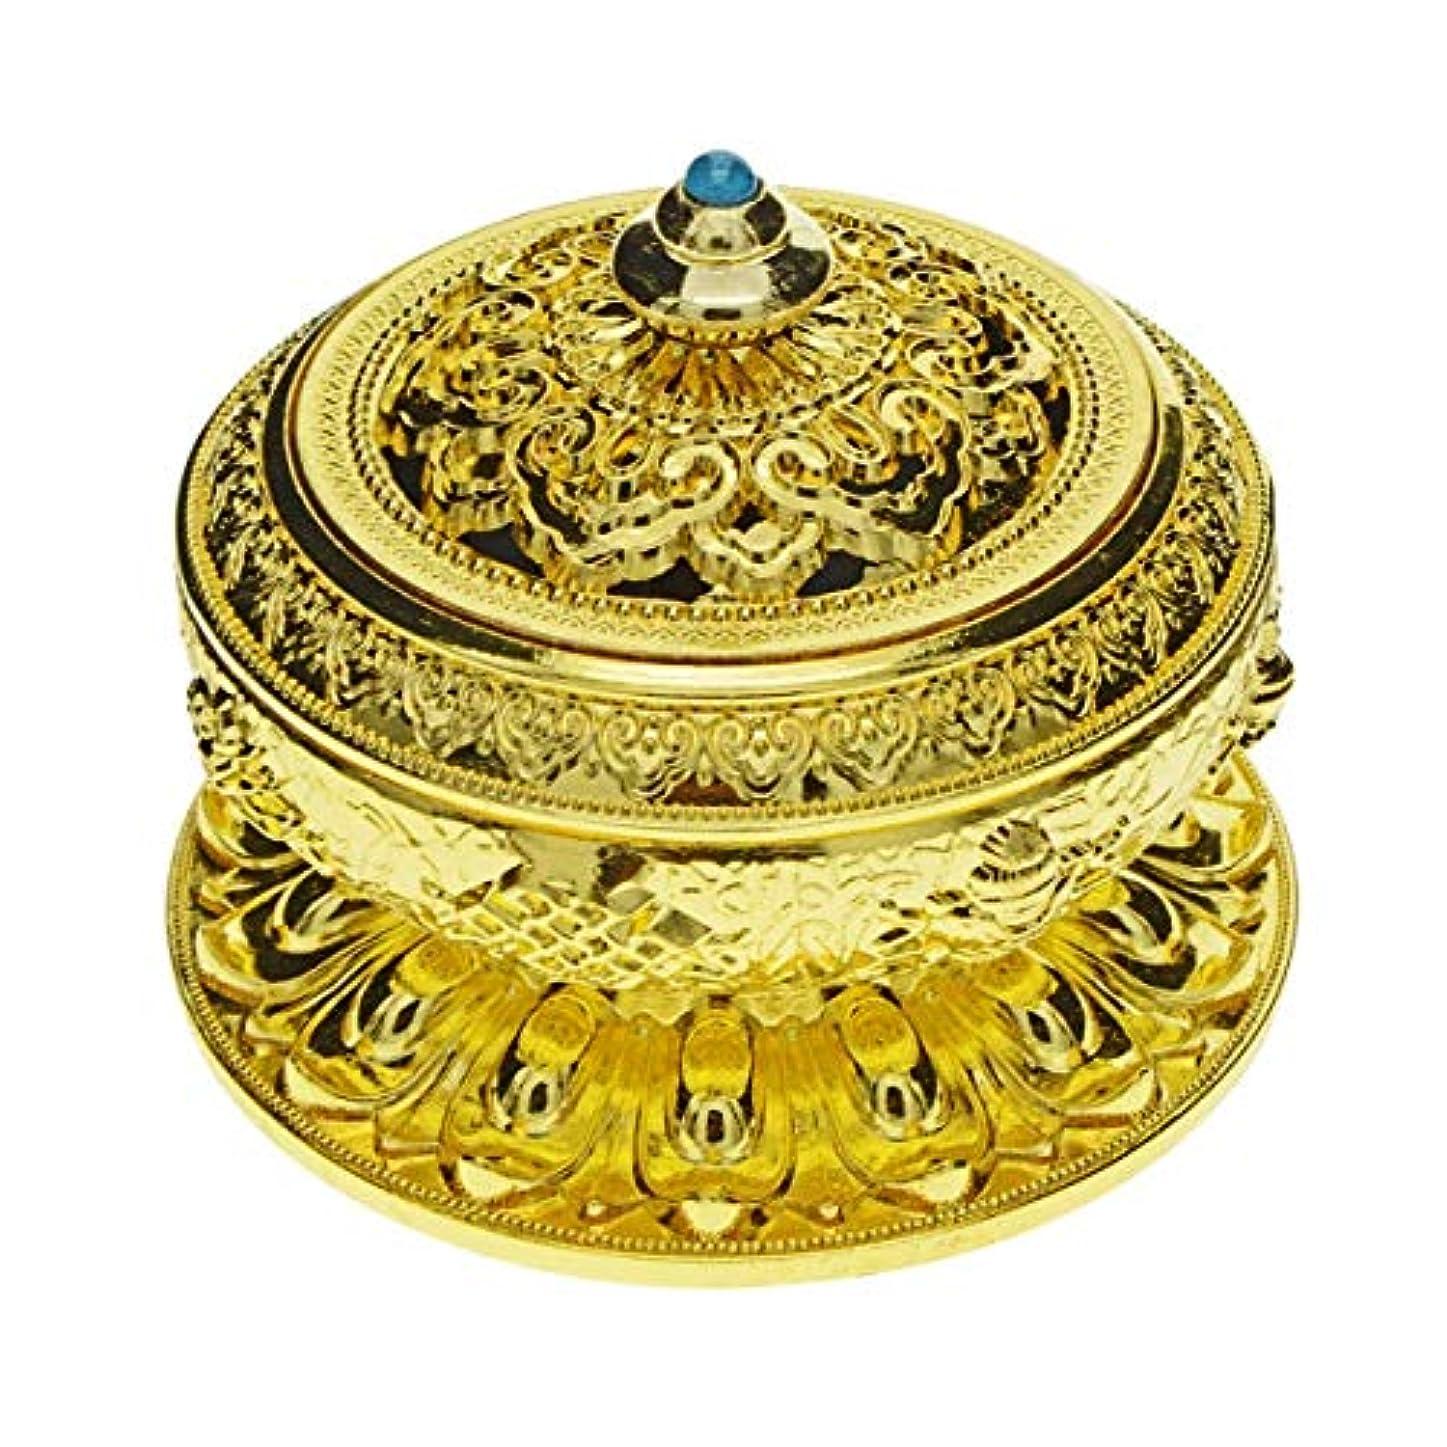 Saim Chineseクラシックスタイル香炉合金メタルBuddha Incense Holder Candle Censer – Buddhist装飾、ホームデコレーション S ゴールド G1HXJJ08952